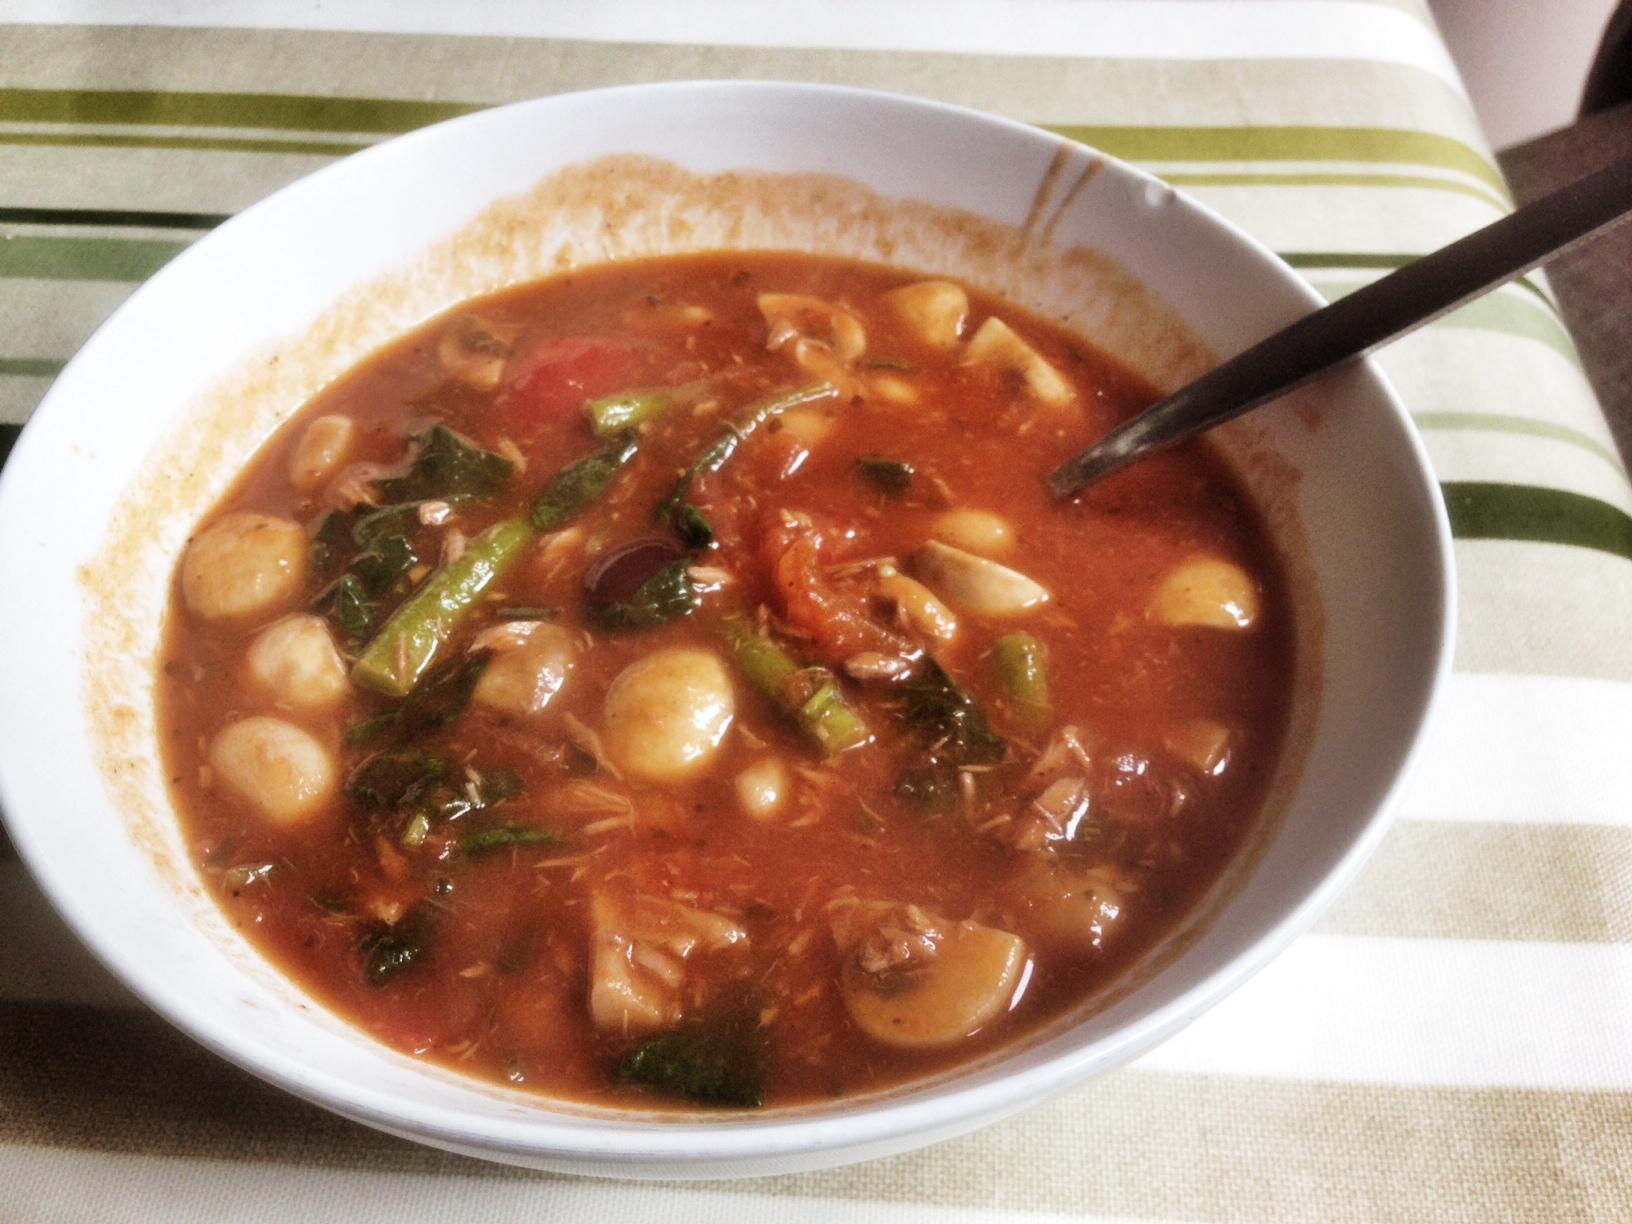 Tuna, Tomato and ButterBean Soup